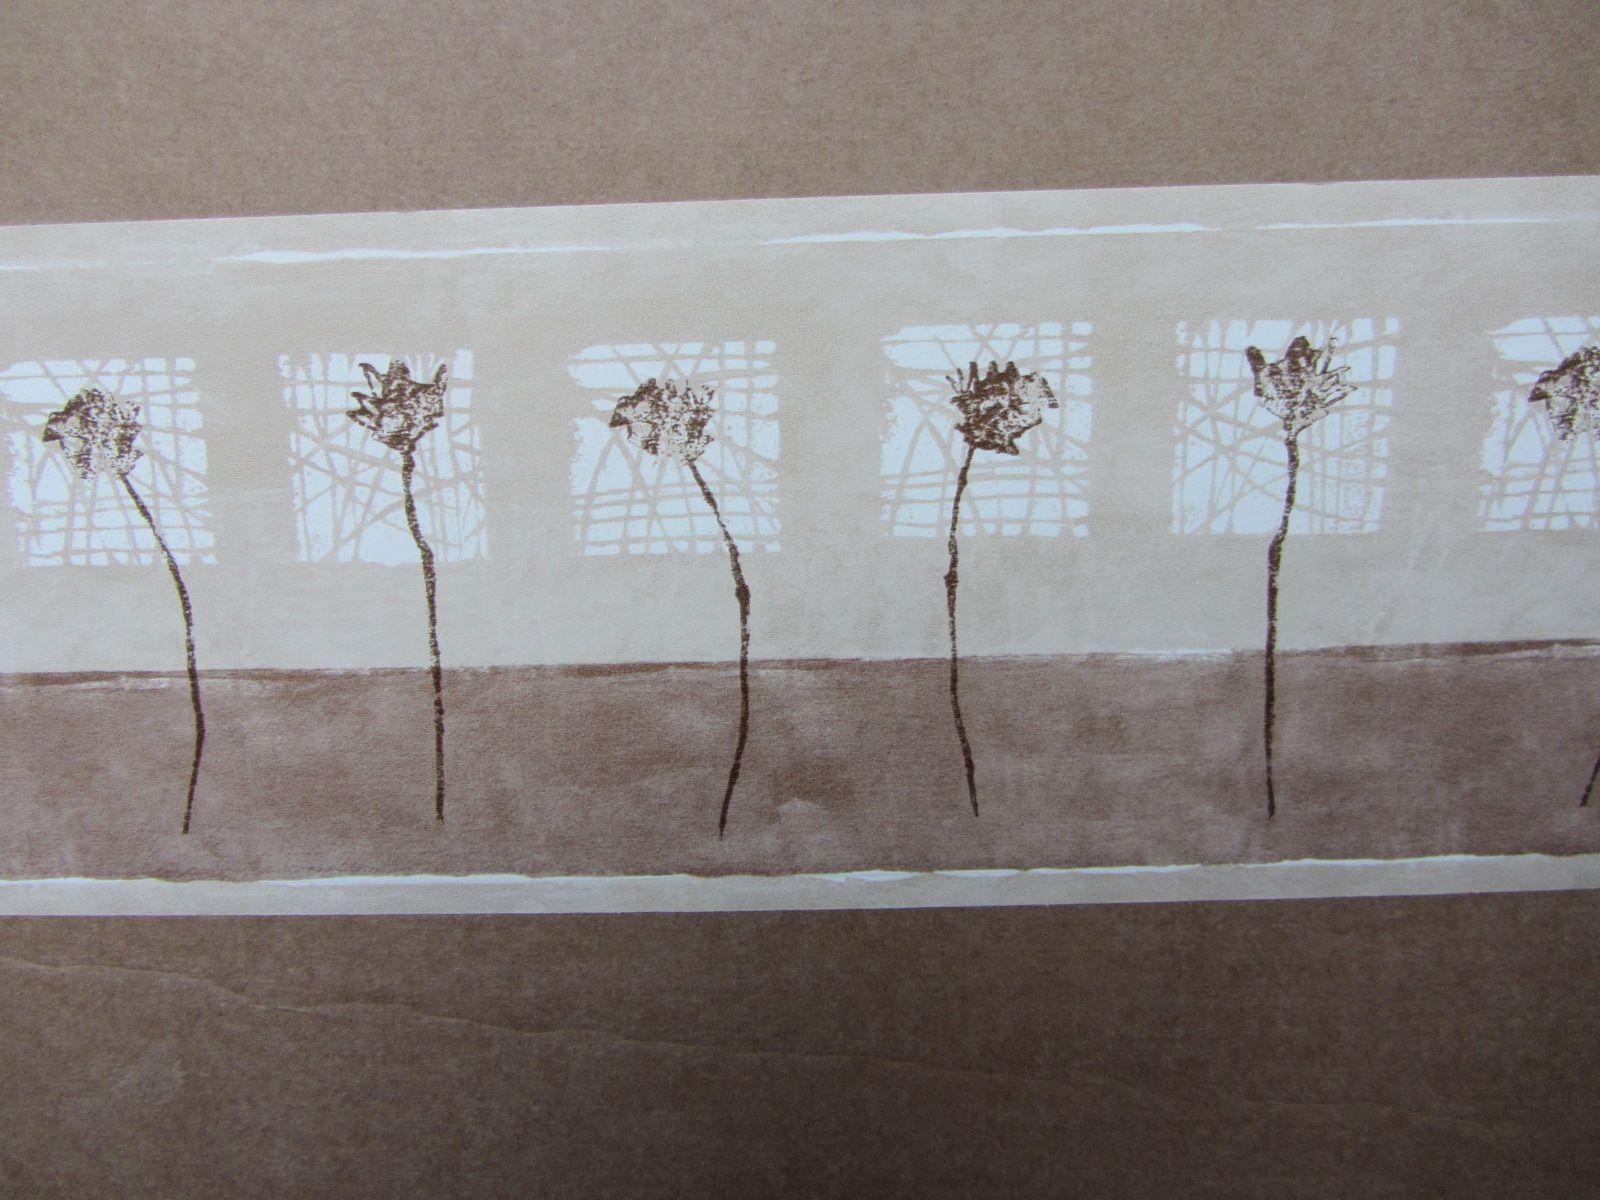 Modern meadow breeze mocha wallpaper border self adhesive stairs